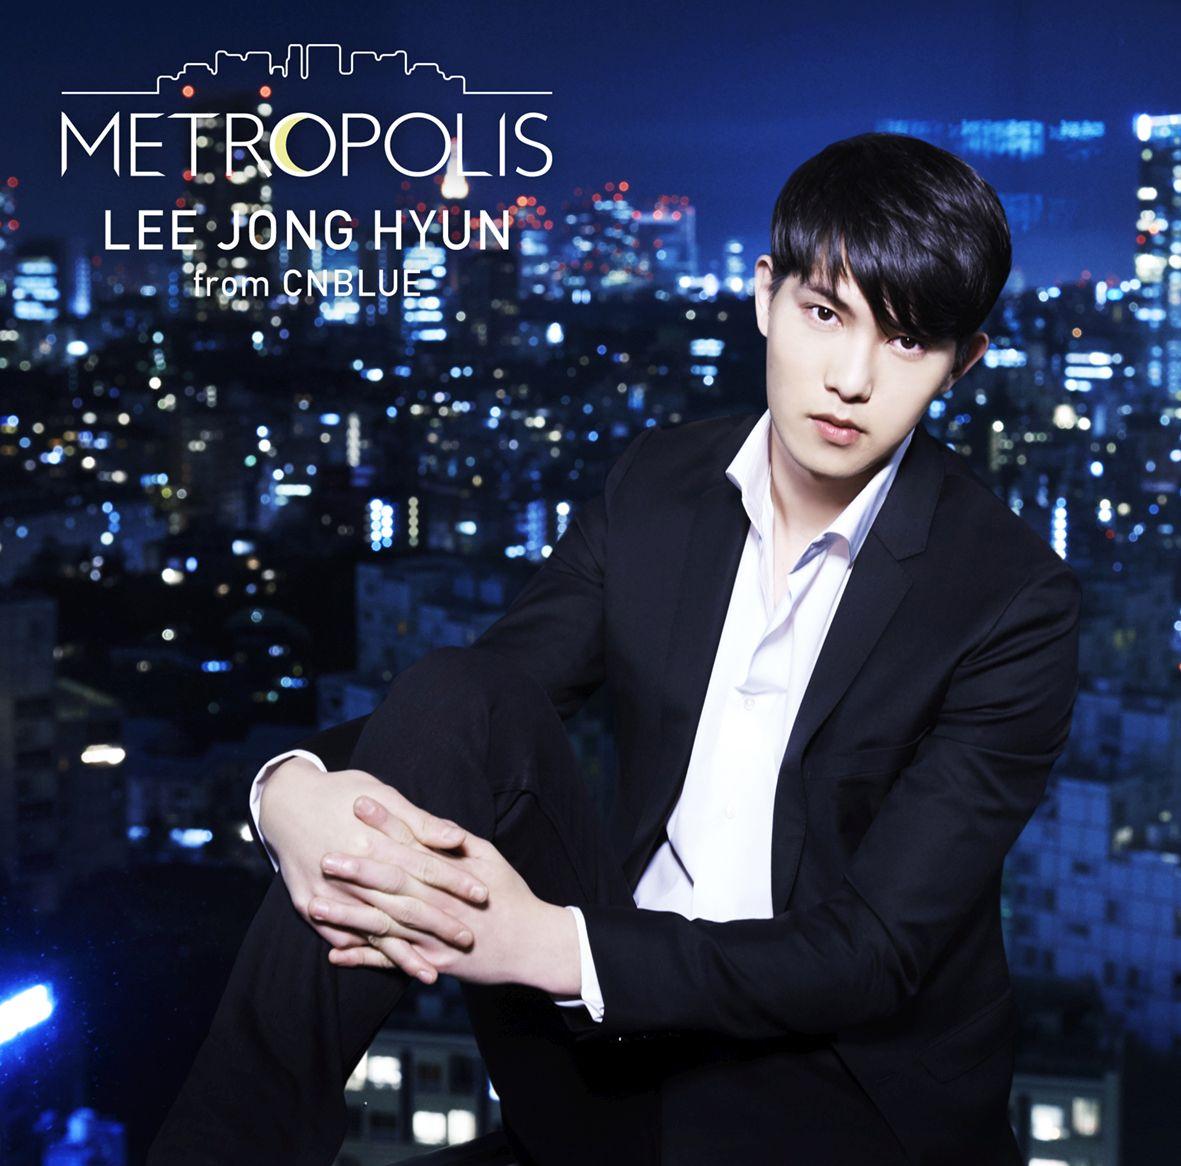 METROPOLIS (初回限定盤 CD+DVD) [ イ・ジョンヒョン(from CNBLUE) ]